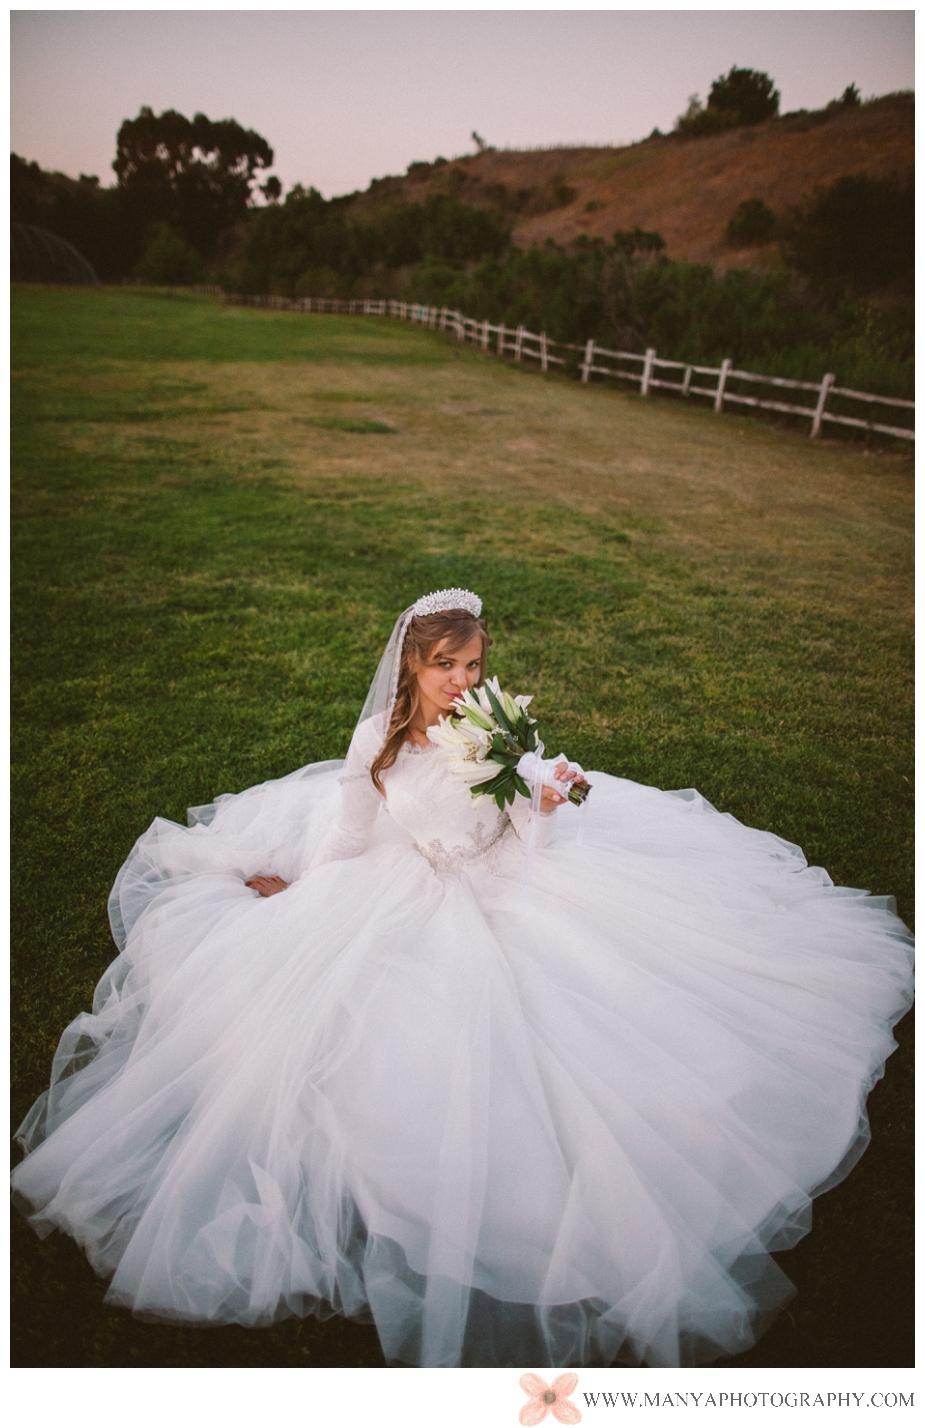 2013-07-23_0038 - Orange County Wedding Photographer